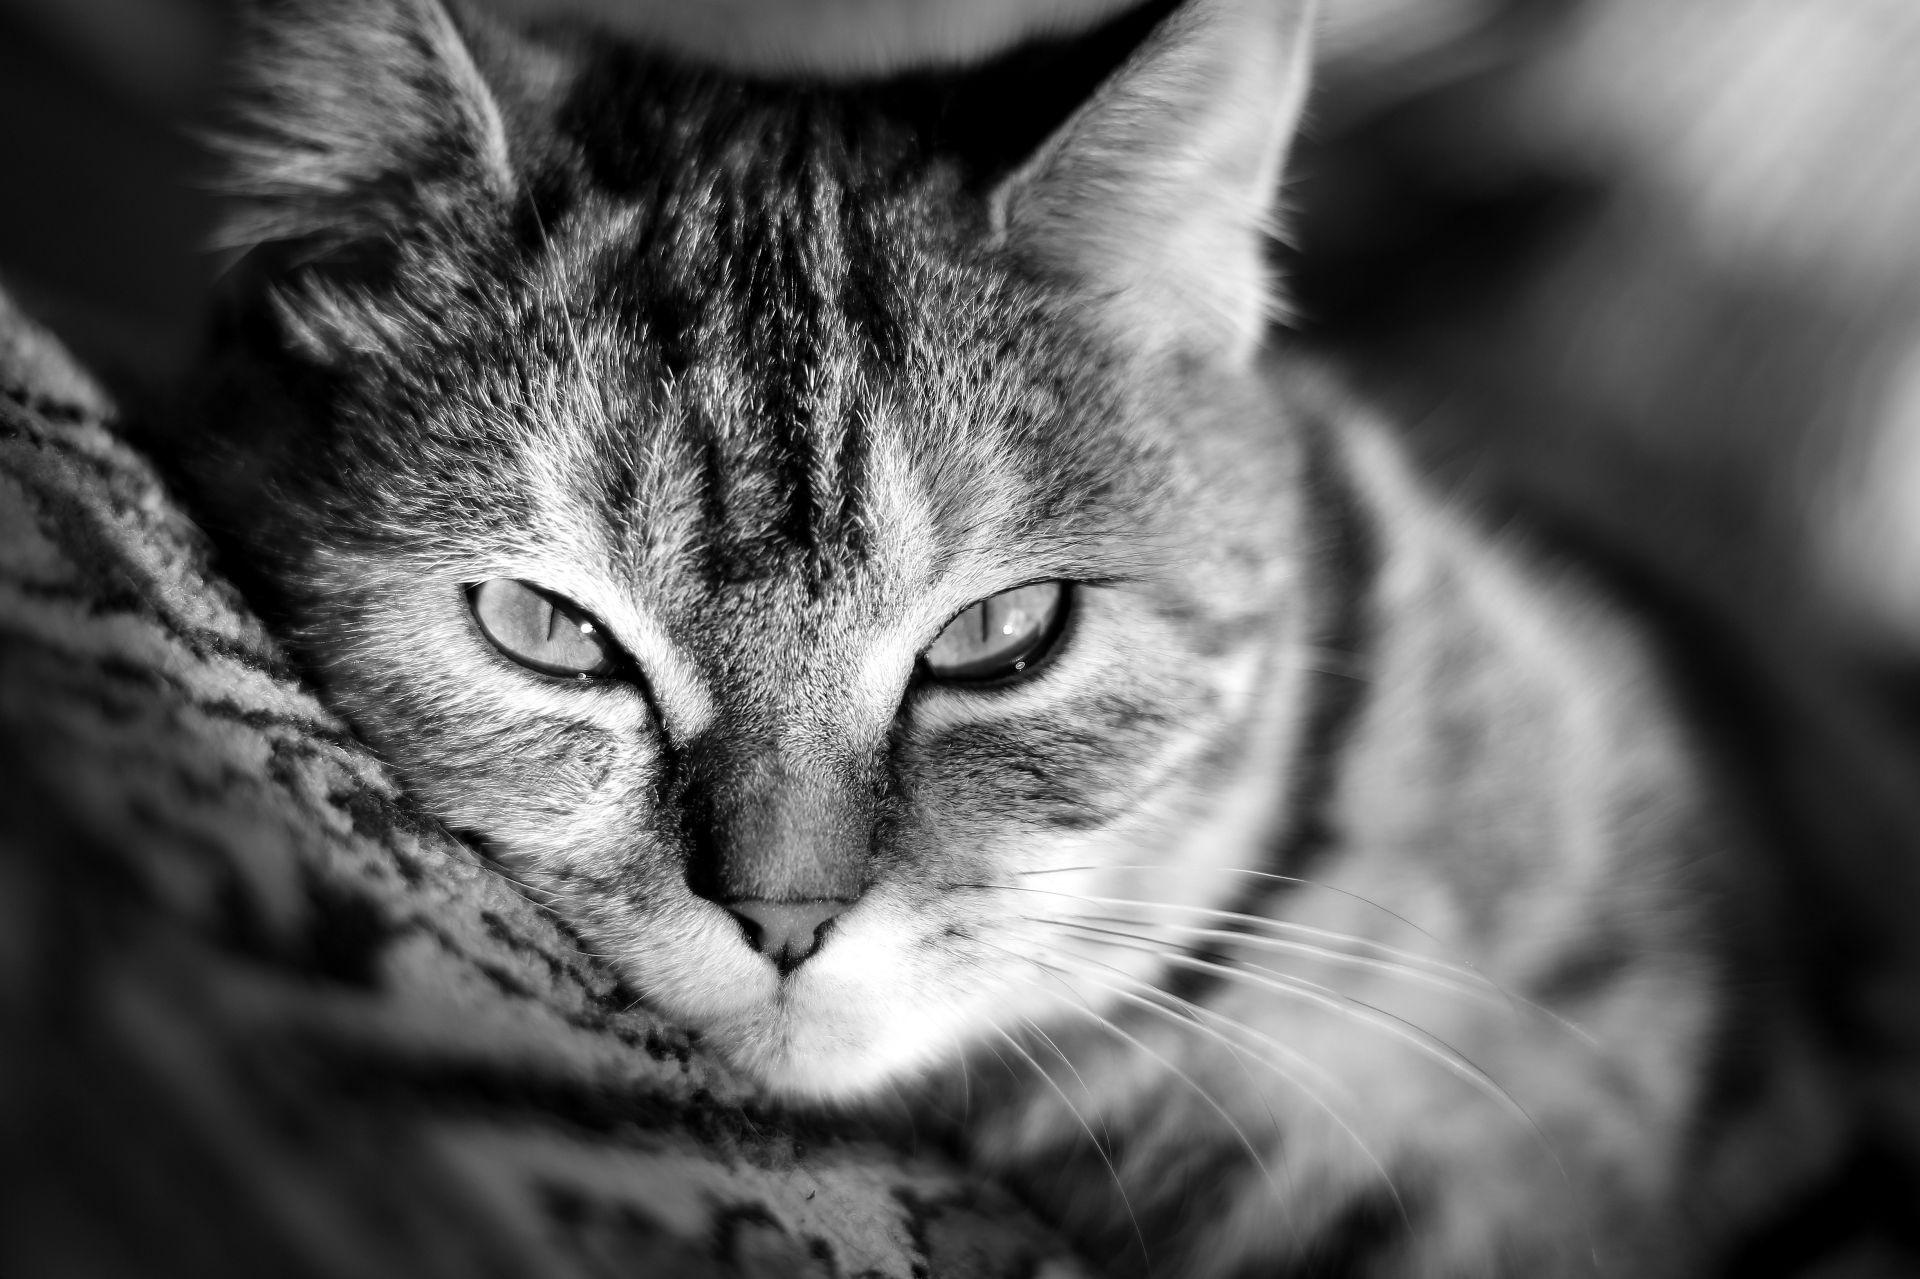 Cat Wallpaper Kitty Cat Look Wallpaper Mustache Nose Cat Desktop